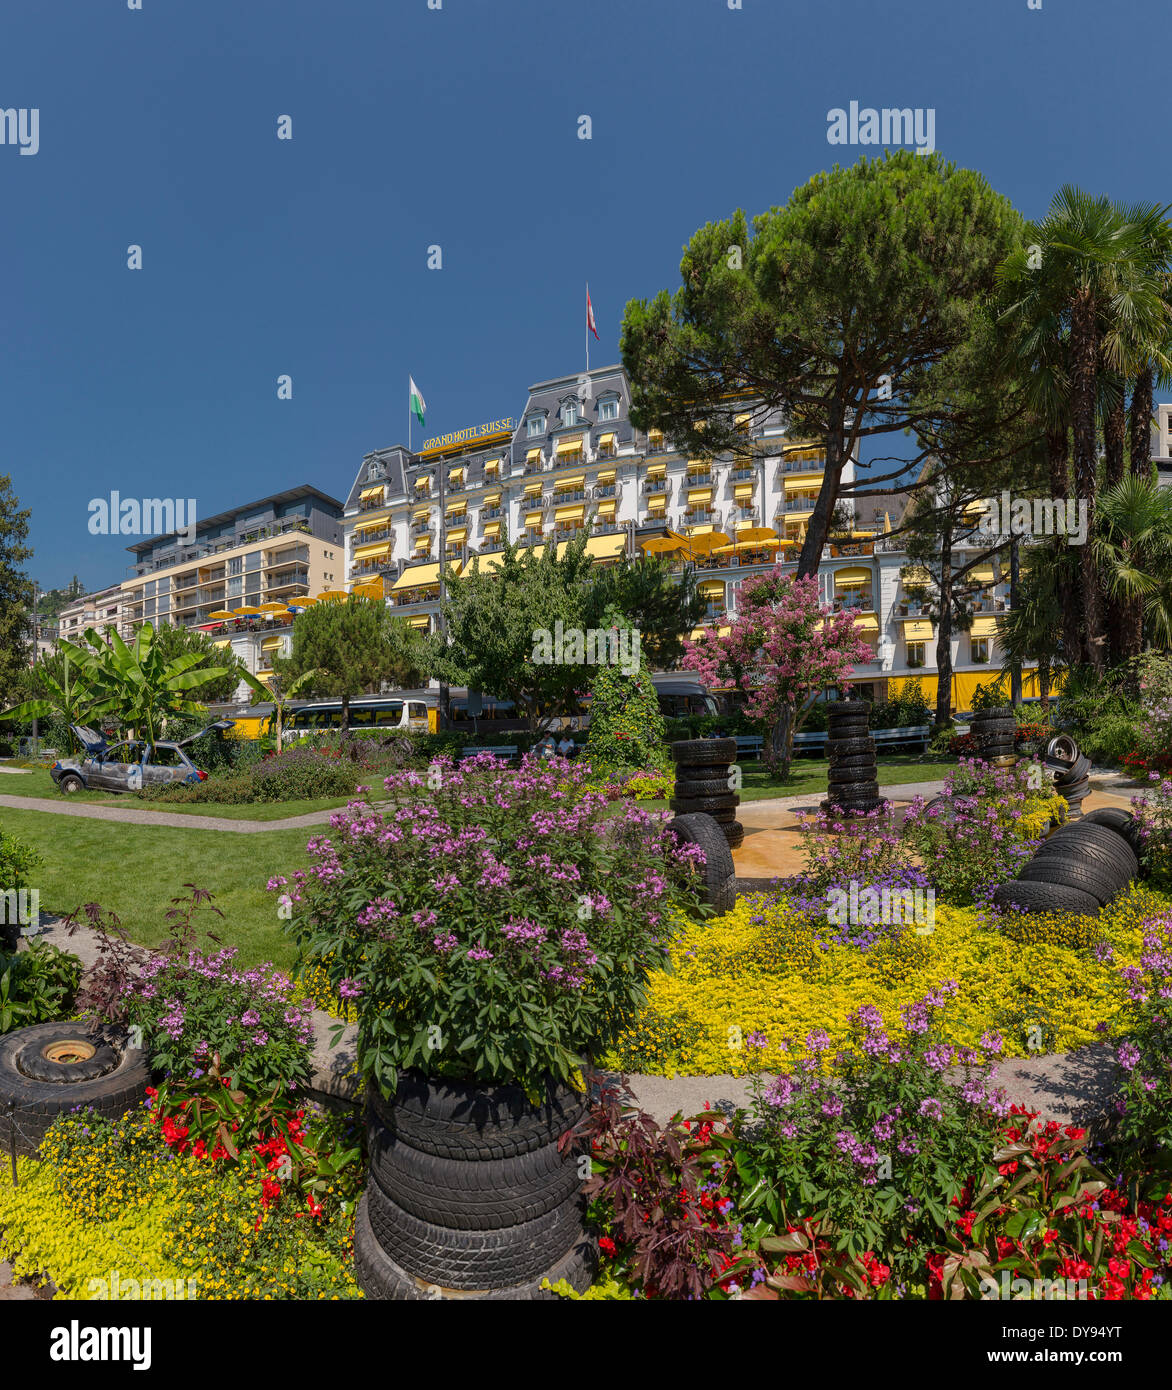 Grand Hotel Suisse hotel park Quai Edouard-Jaccoud town village flowers summer garden park Montreux Vaud Switzerland Europe, - Stock Image